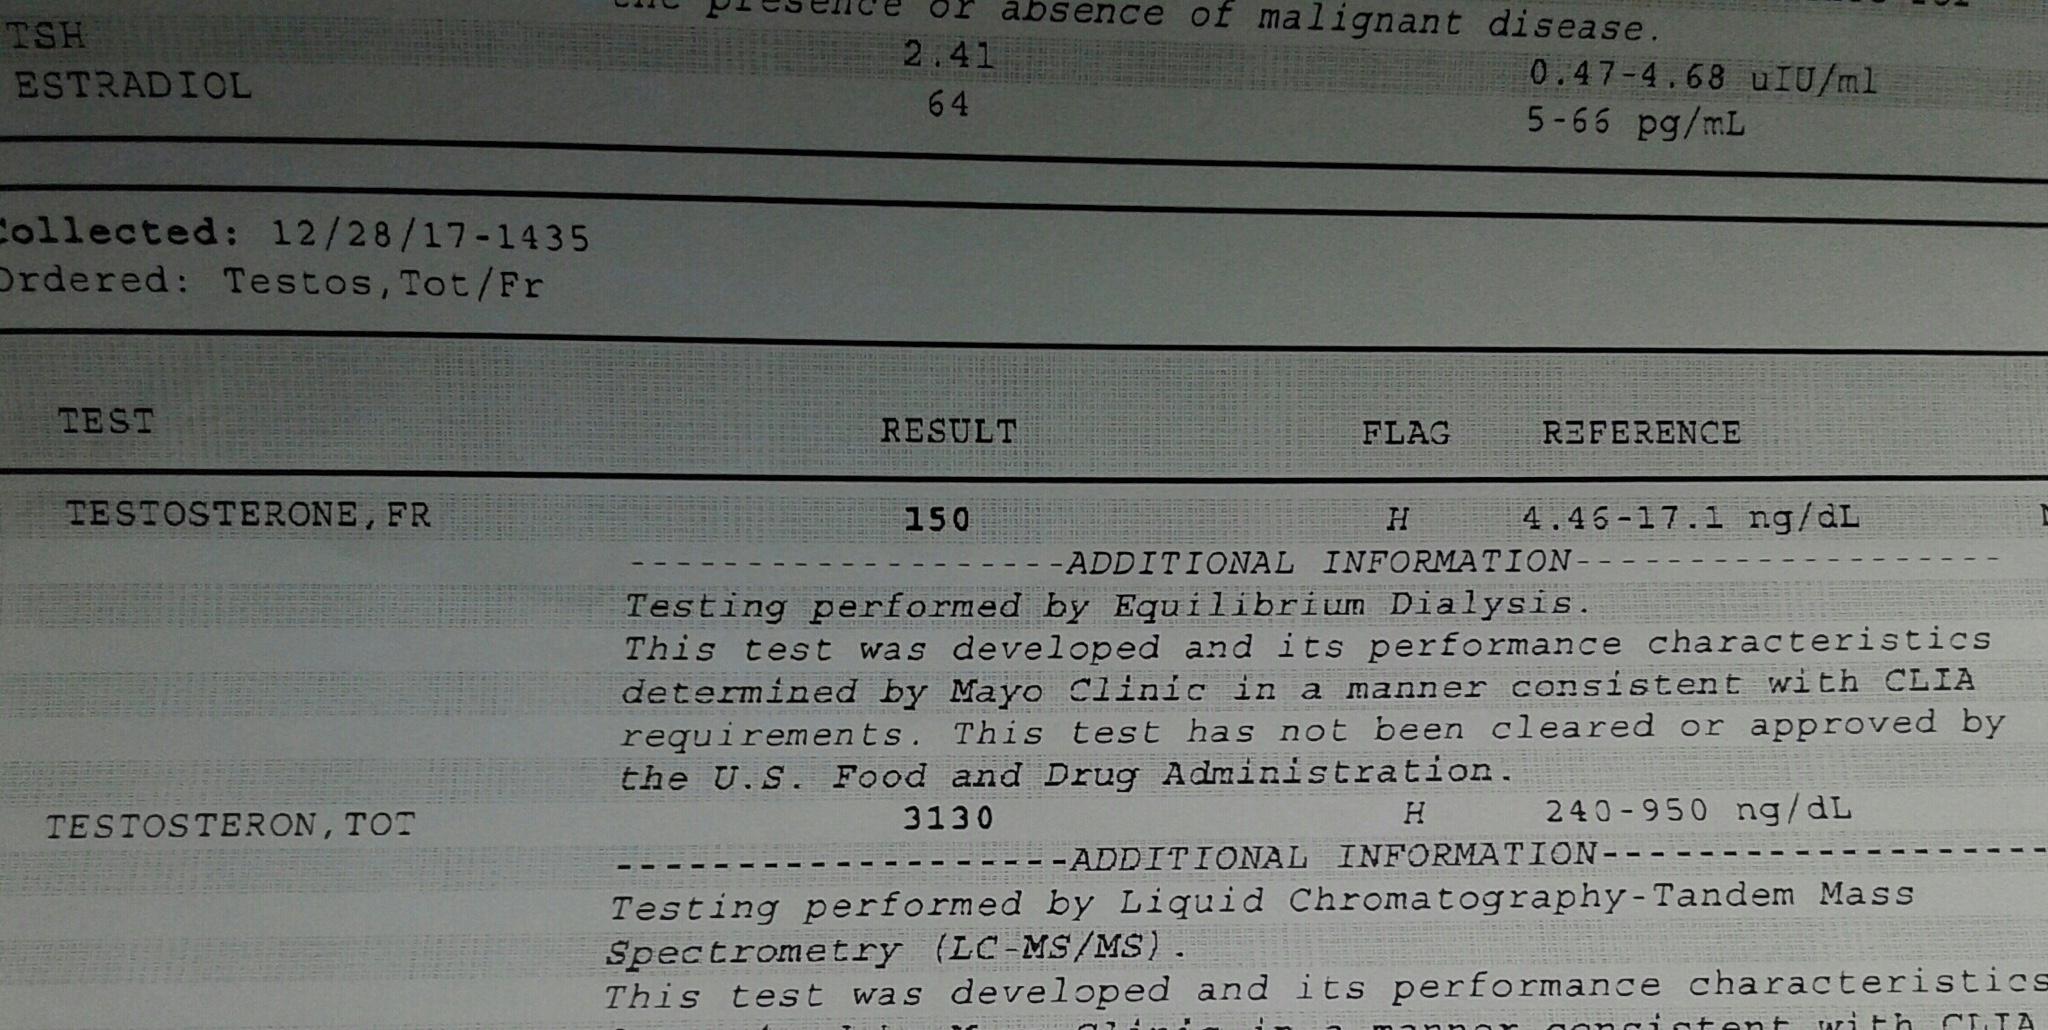 Victory Pharma Test P blood work